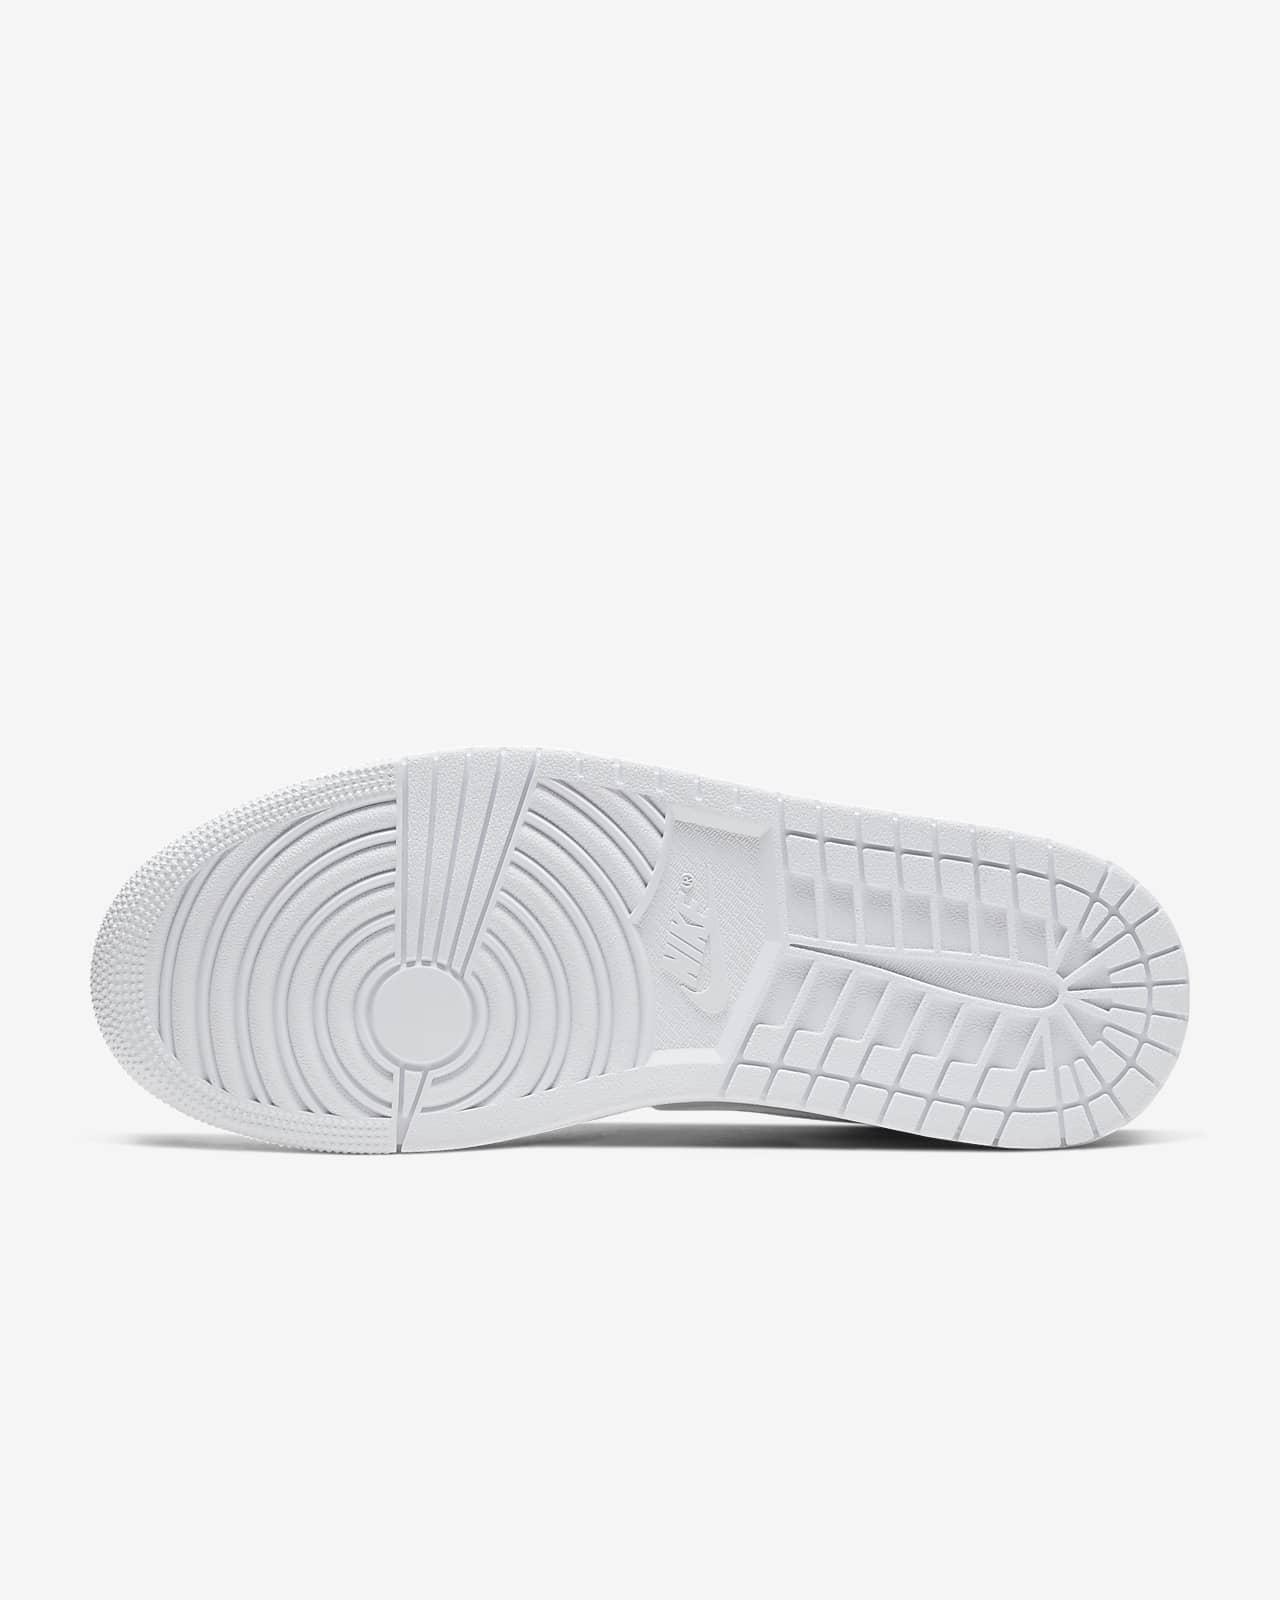 air jordan 1 mid scarpe da basket donna